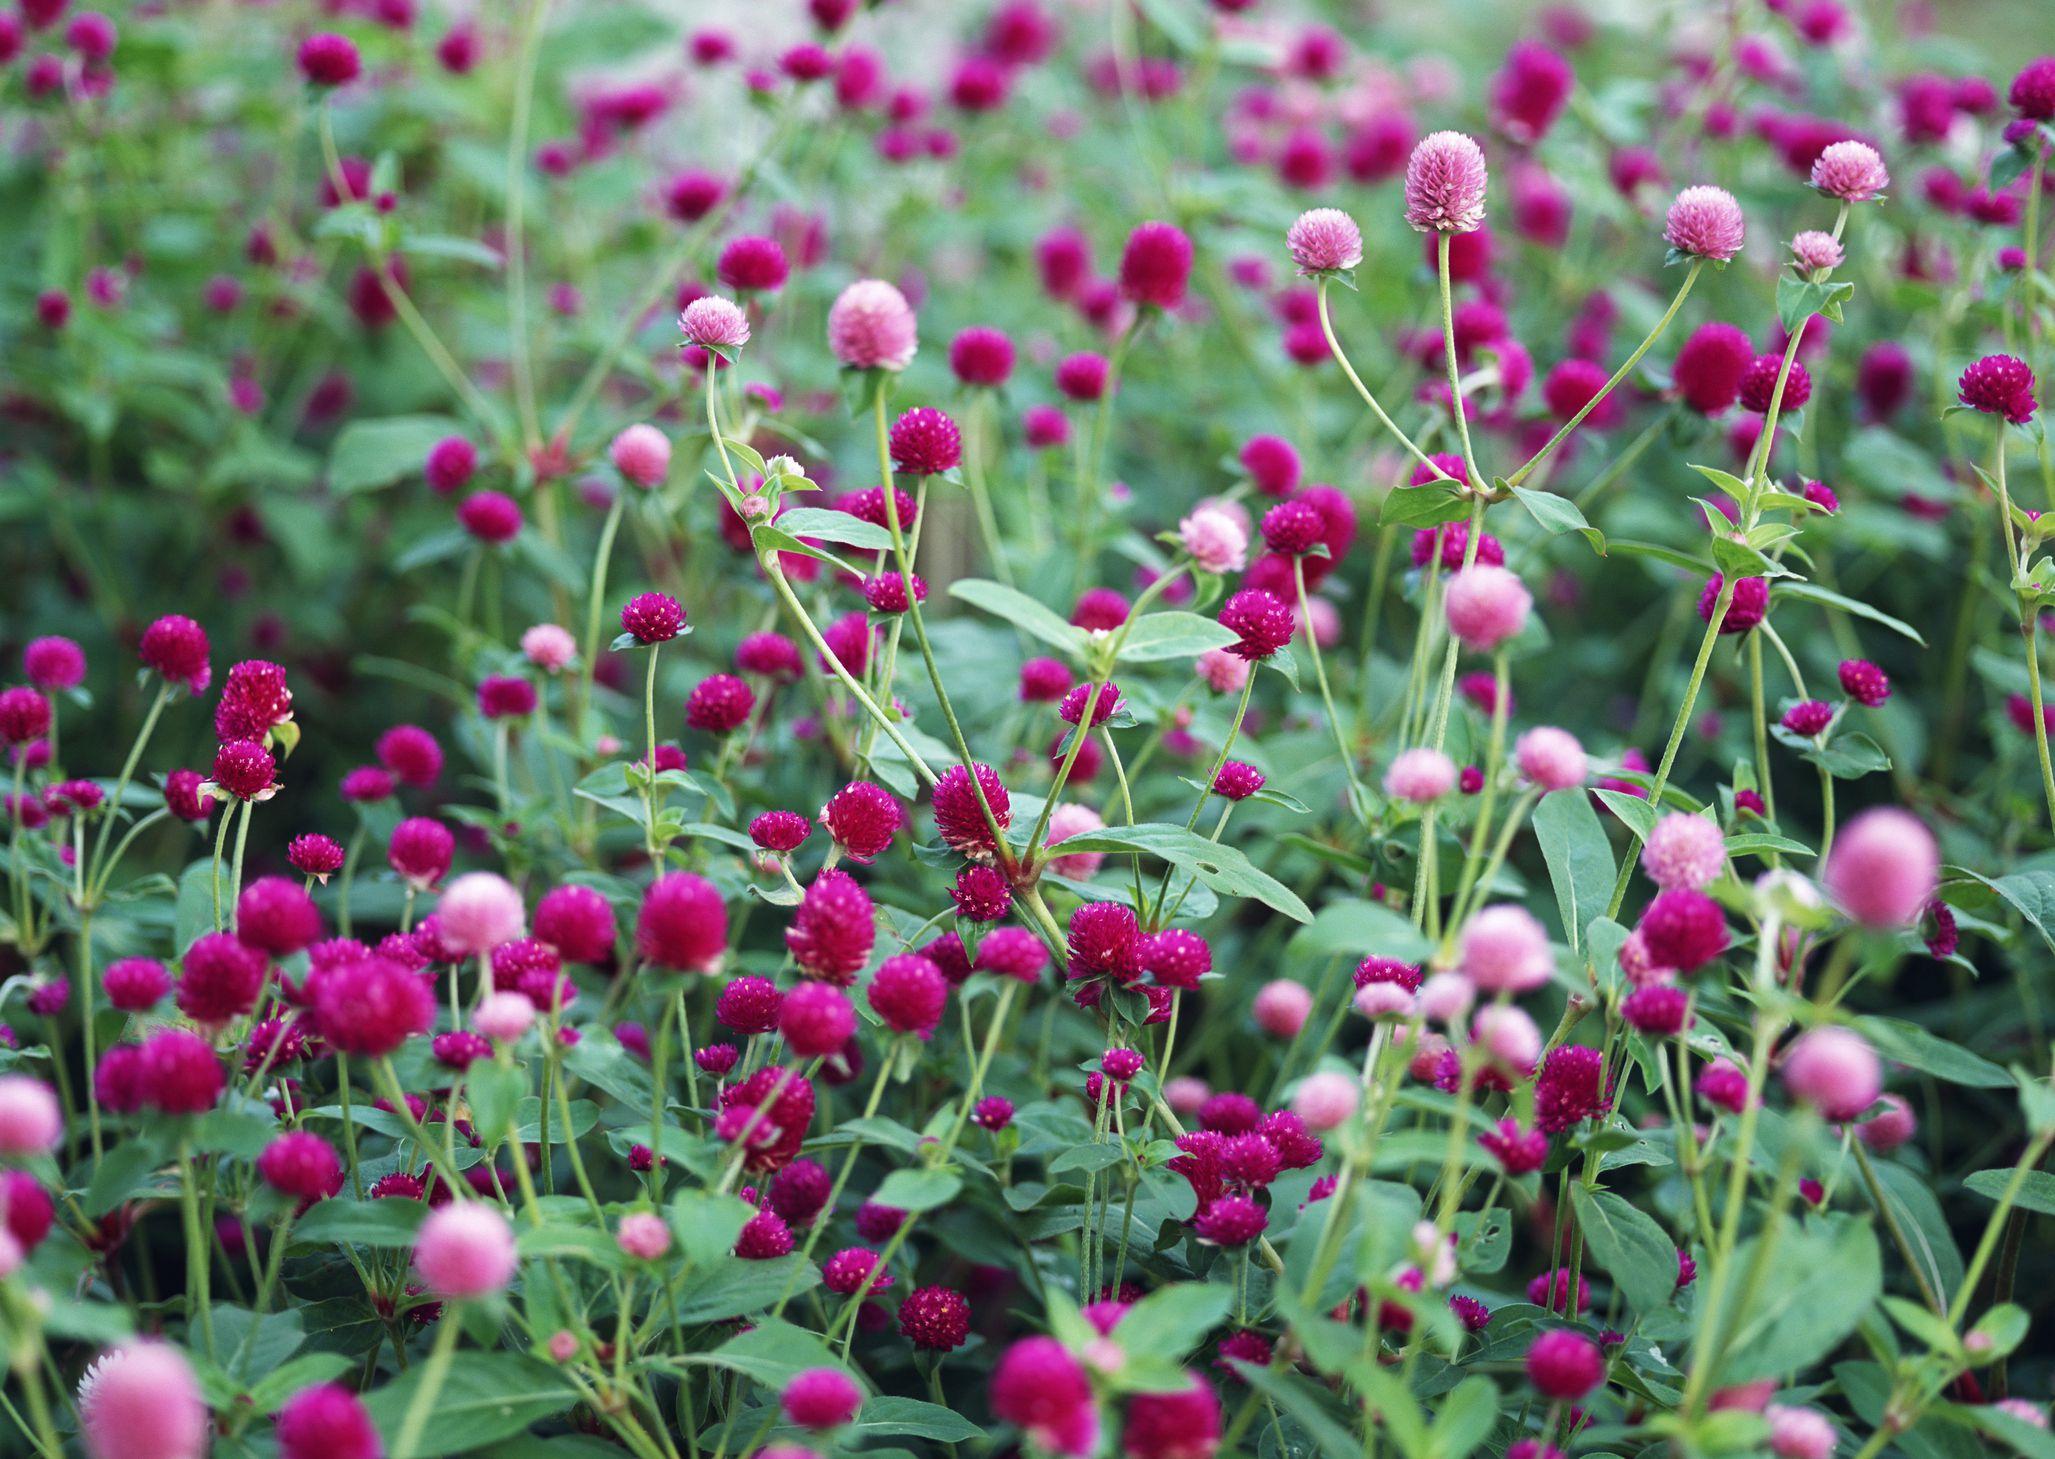 Growing Drought Tolerant Globe Amaranth Flowers